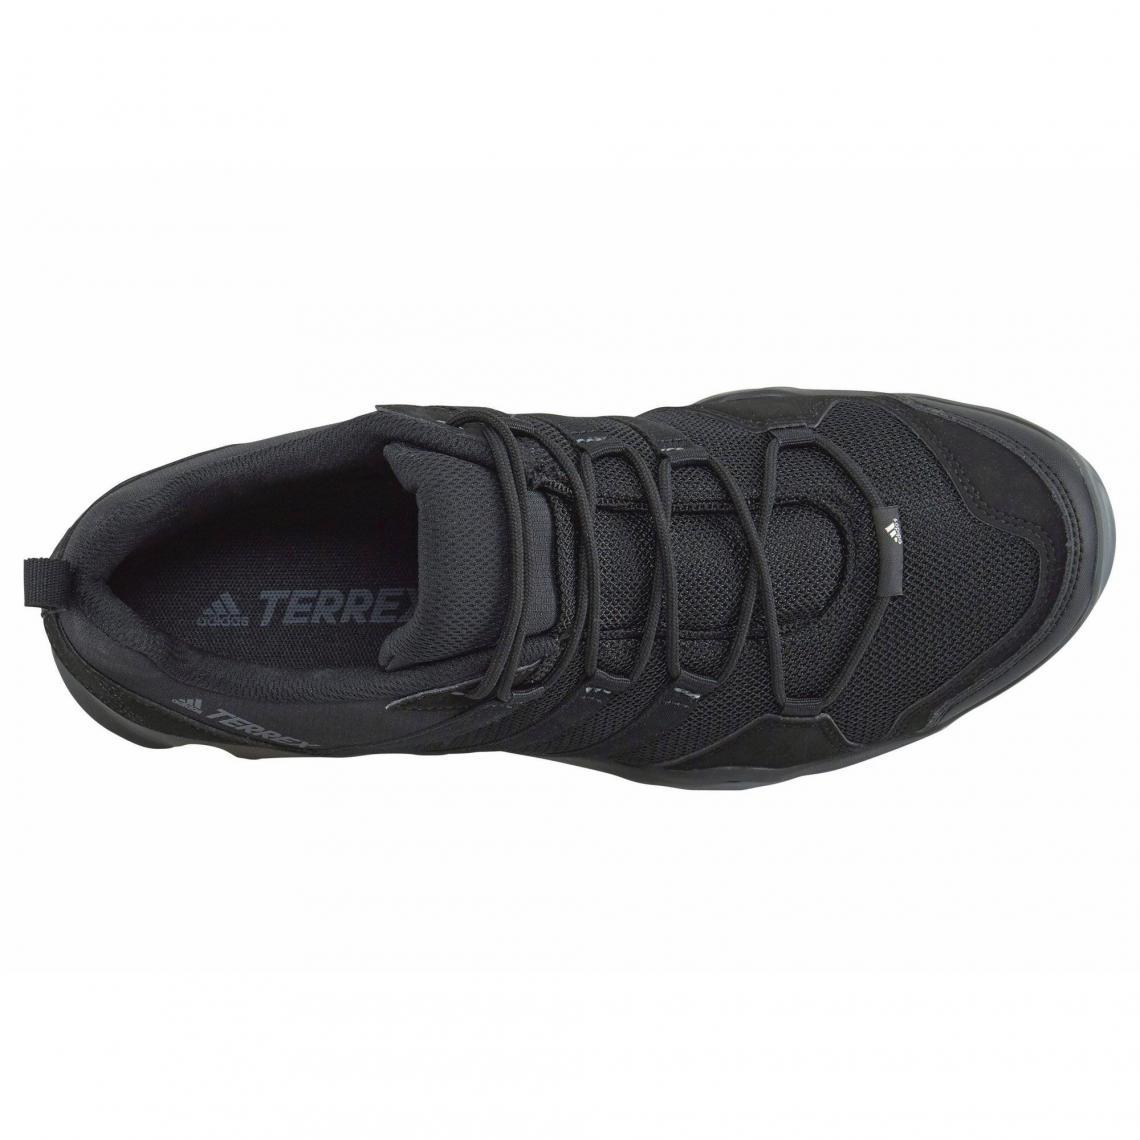 Adidas Terrex Ax2r Hommes Taille Basse Randonnée Marron